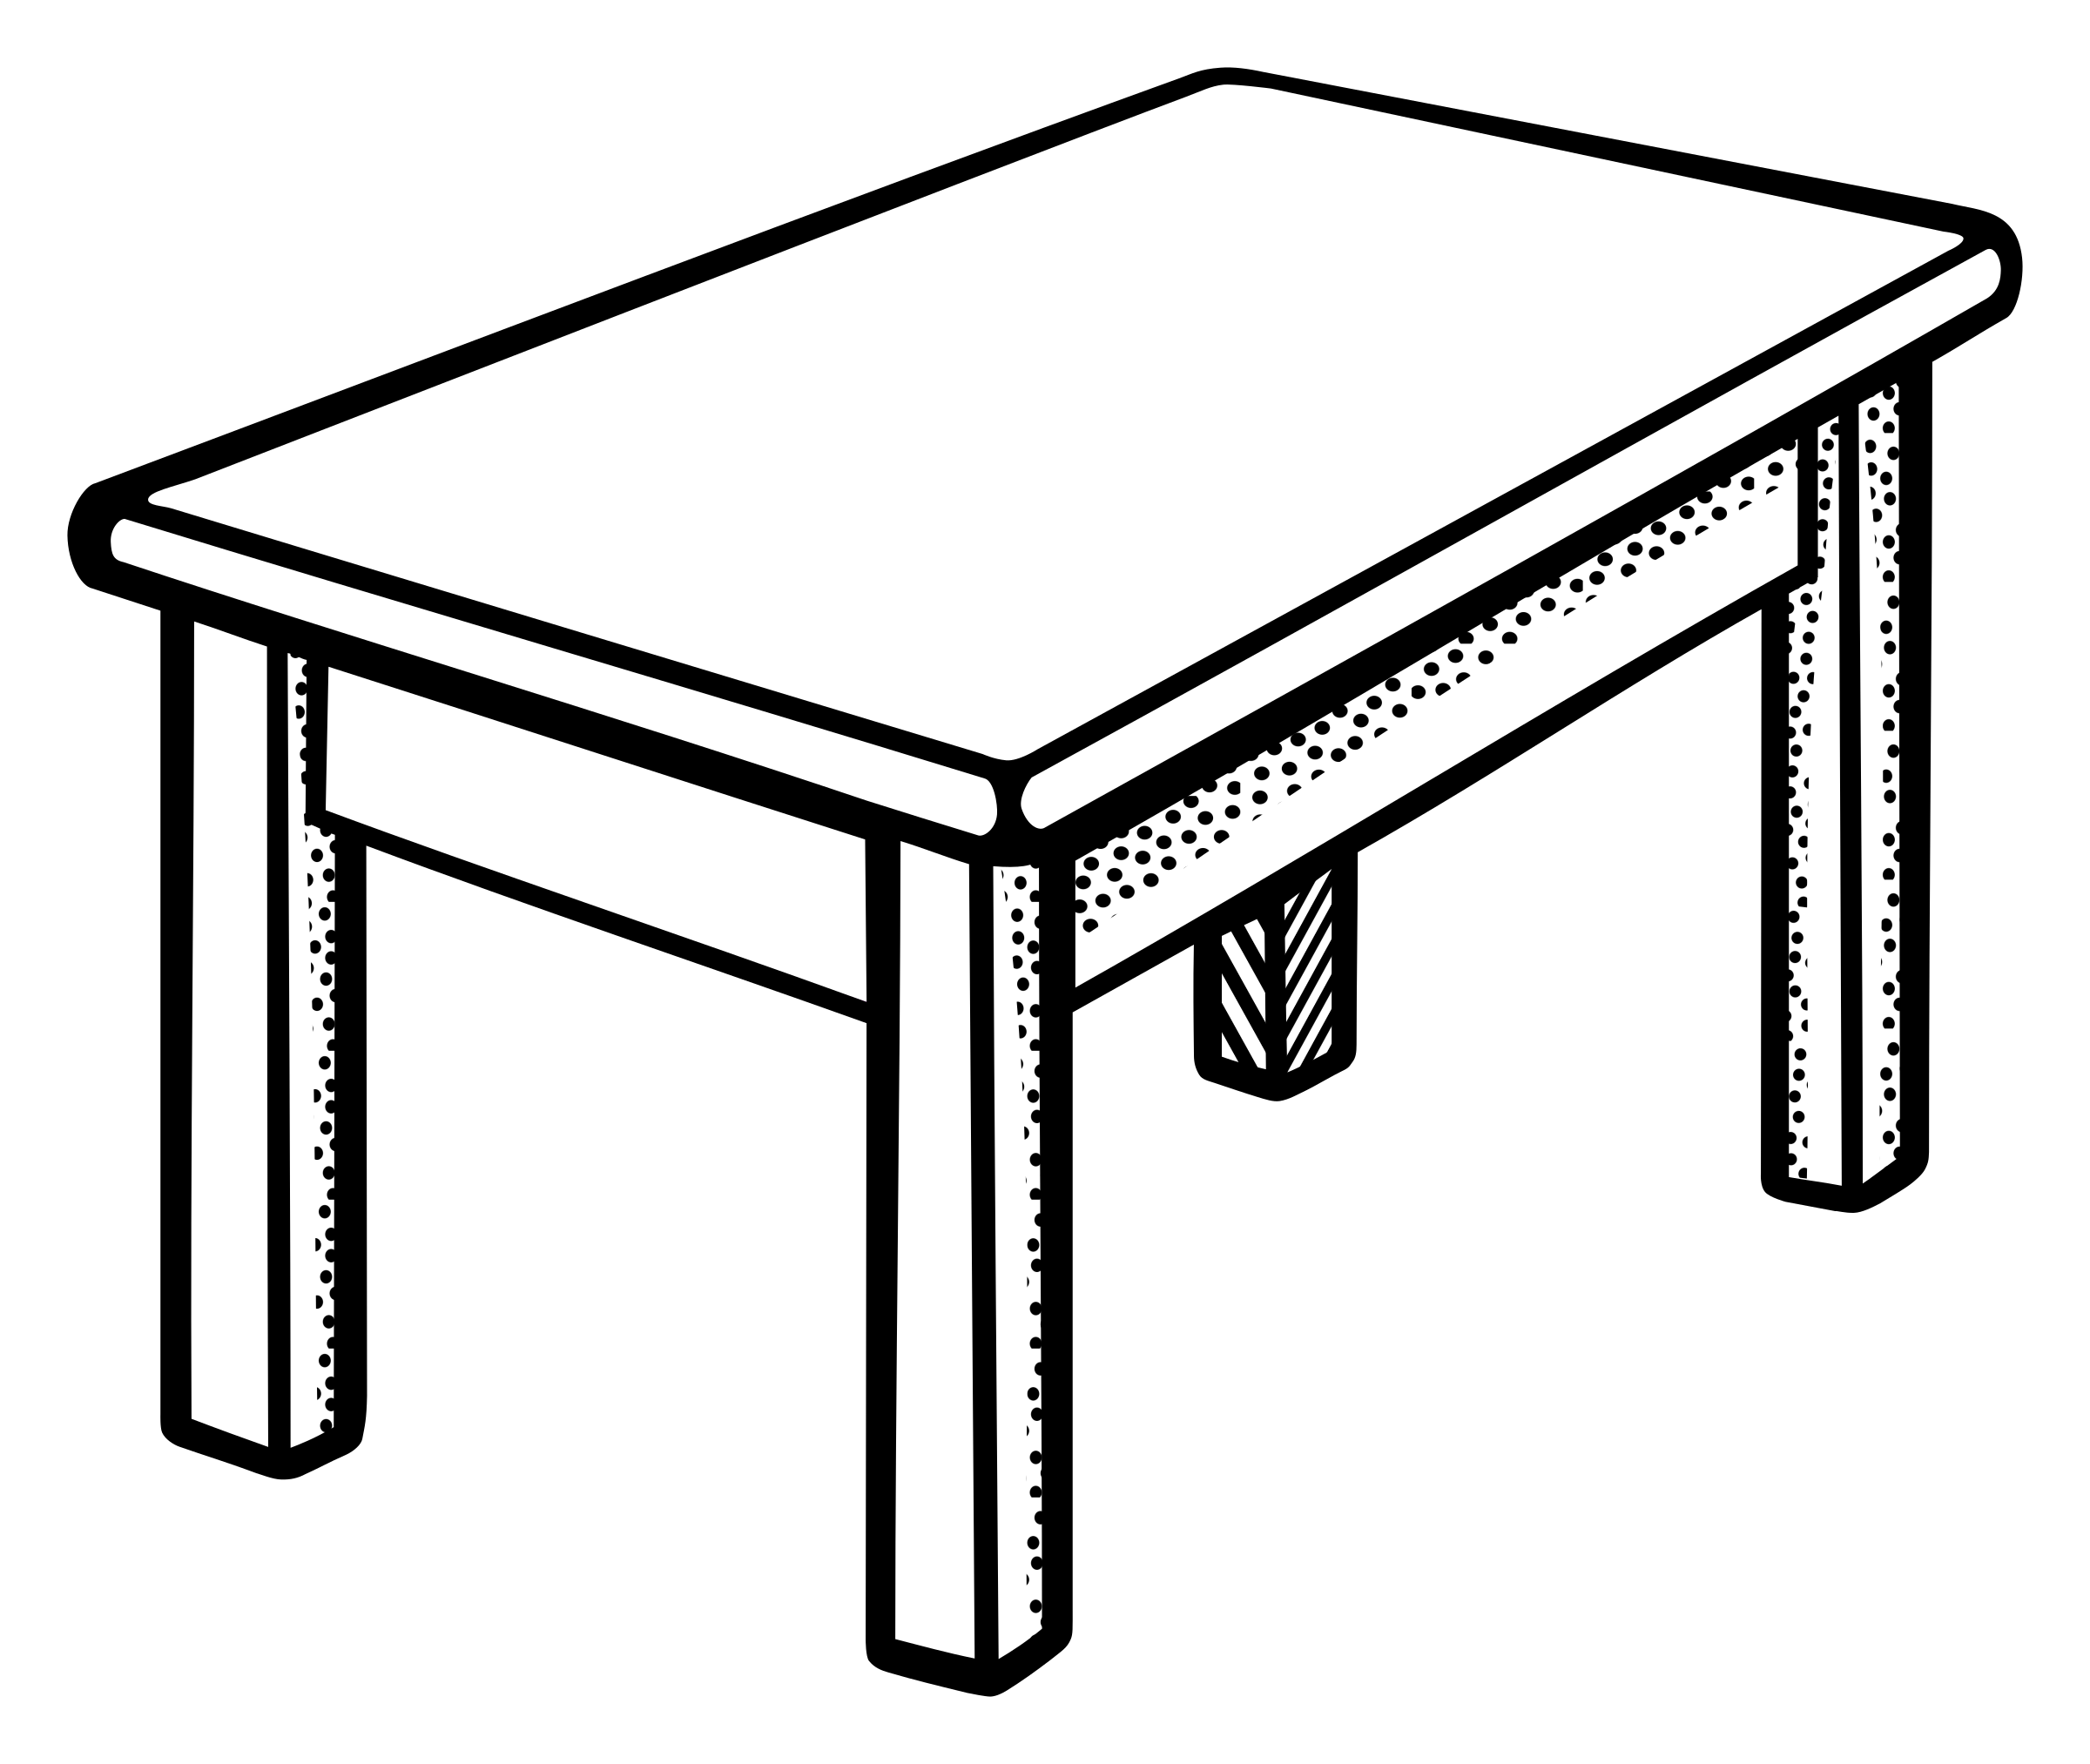 Clip art tables clipartall - Table Clip Art